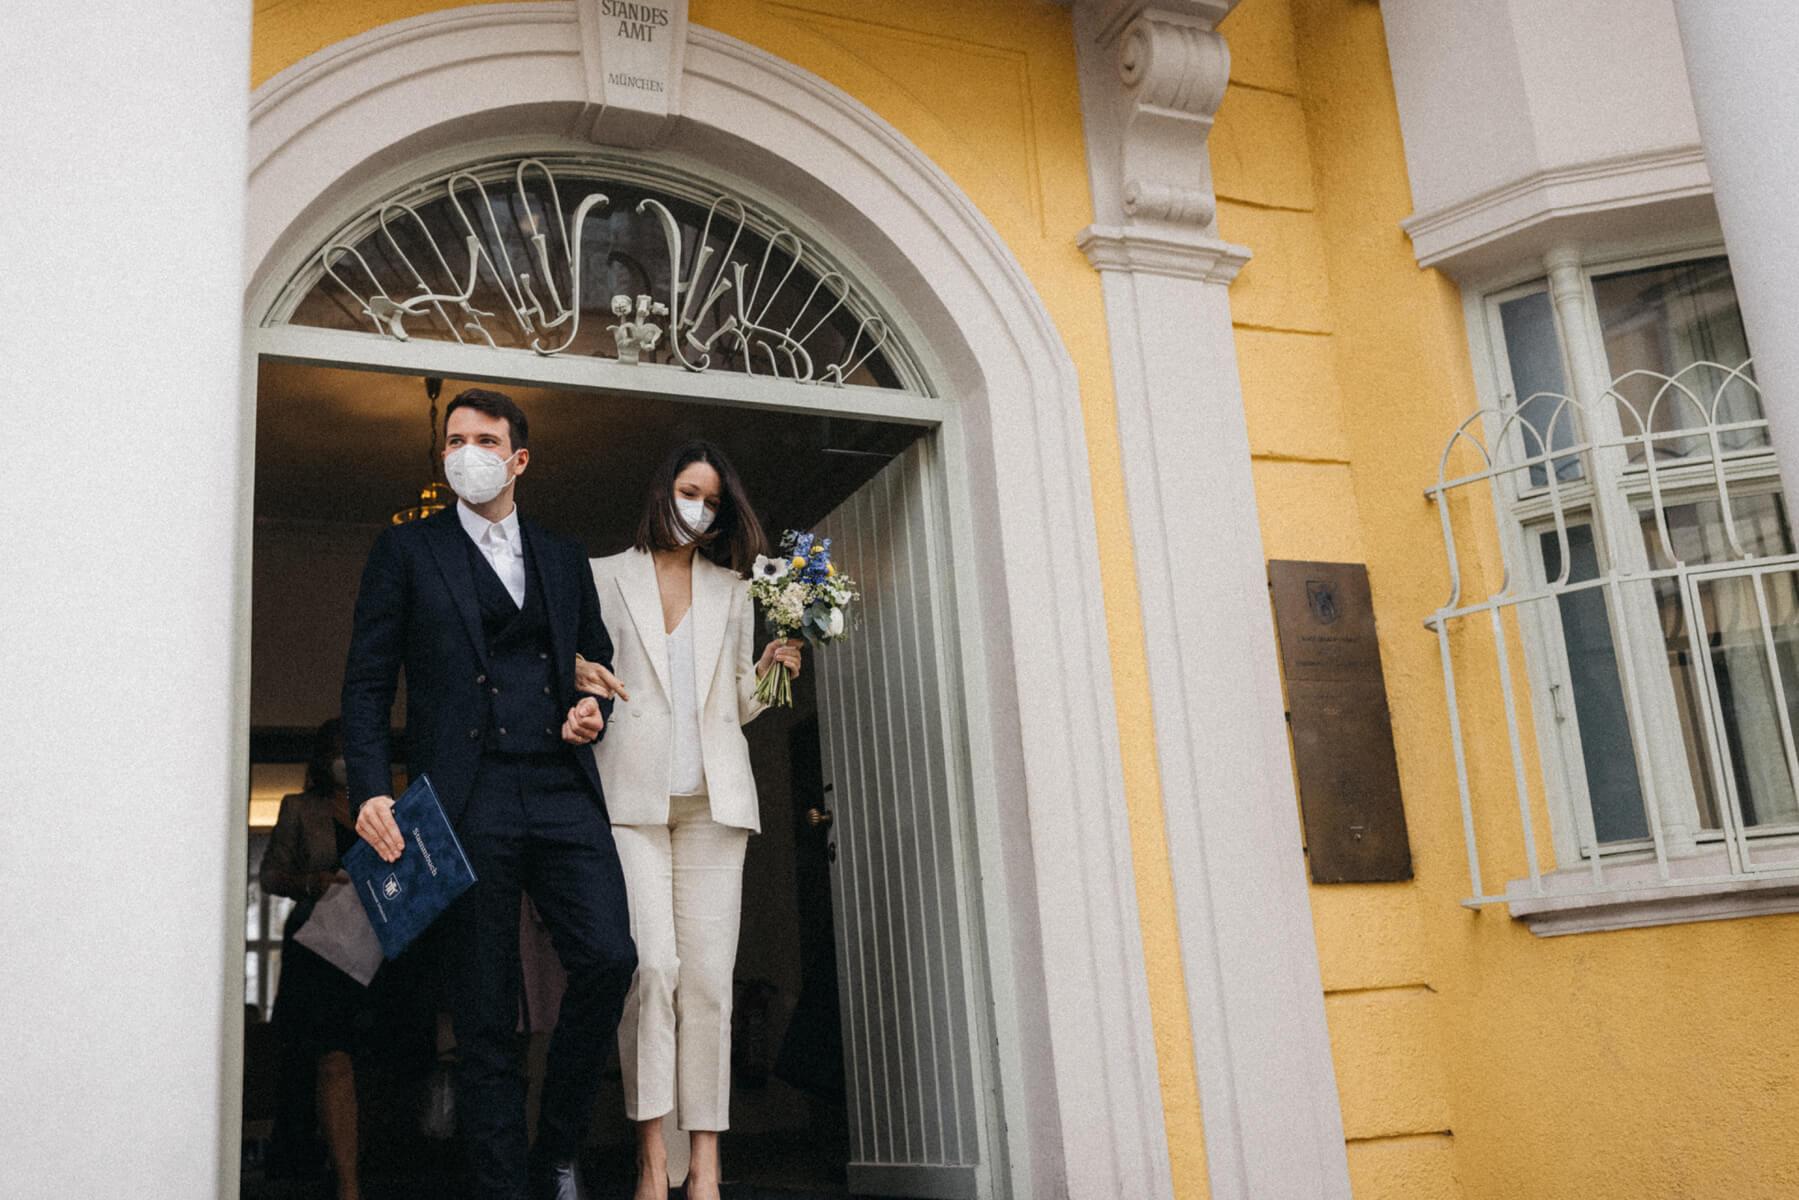 raissa simon fotografie urban civil wedding munich 030 - Nikolija + Niko